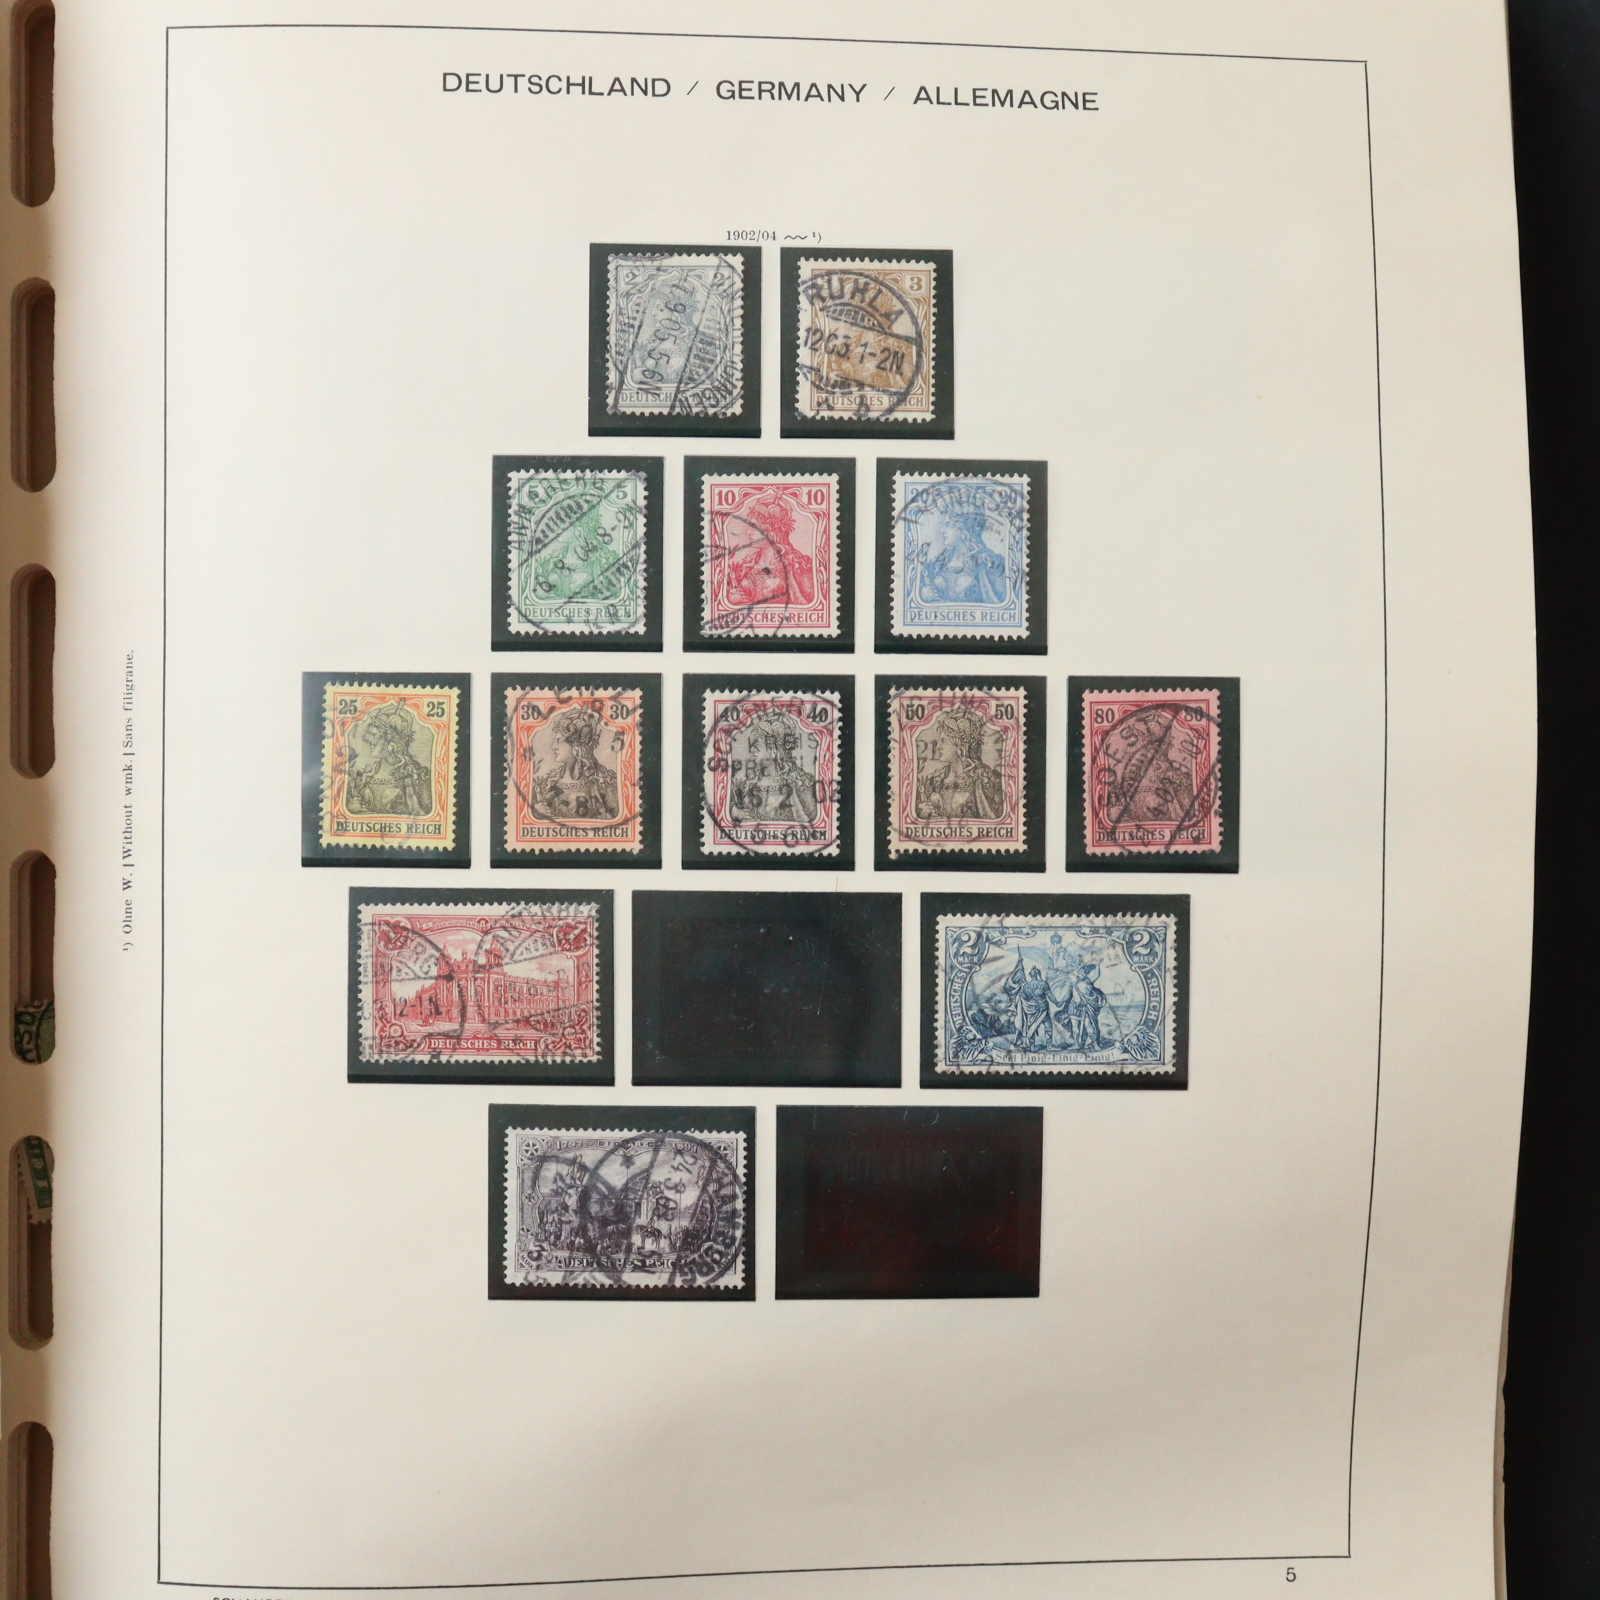 Lot 1239 - COLLECTIONS & ACCUMULATIONS Deutsches Reich -  Auktionshaus Schlegel 26 Public Auction